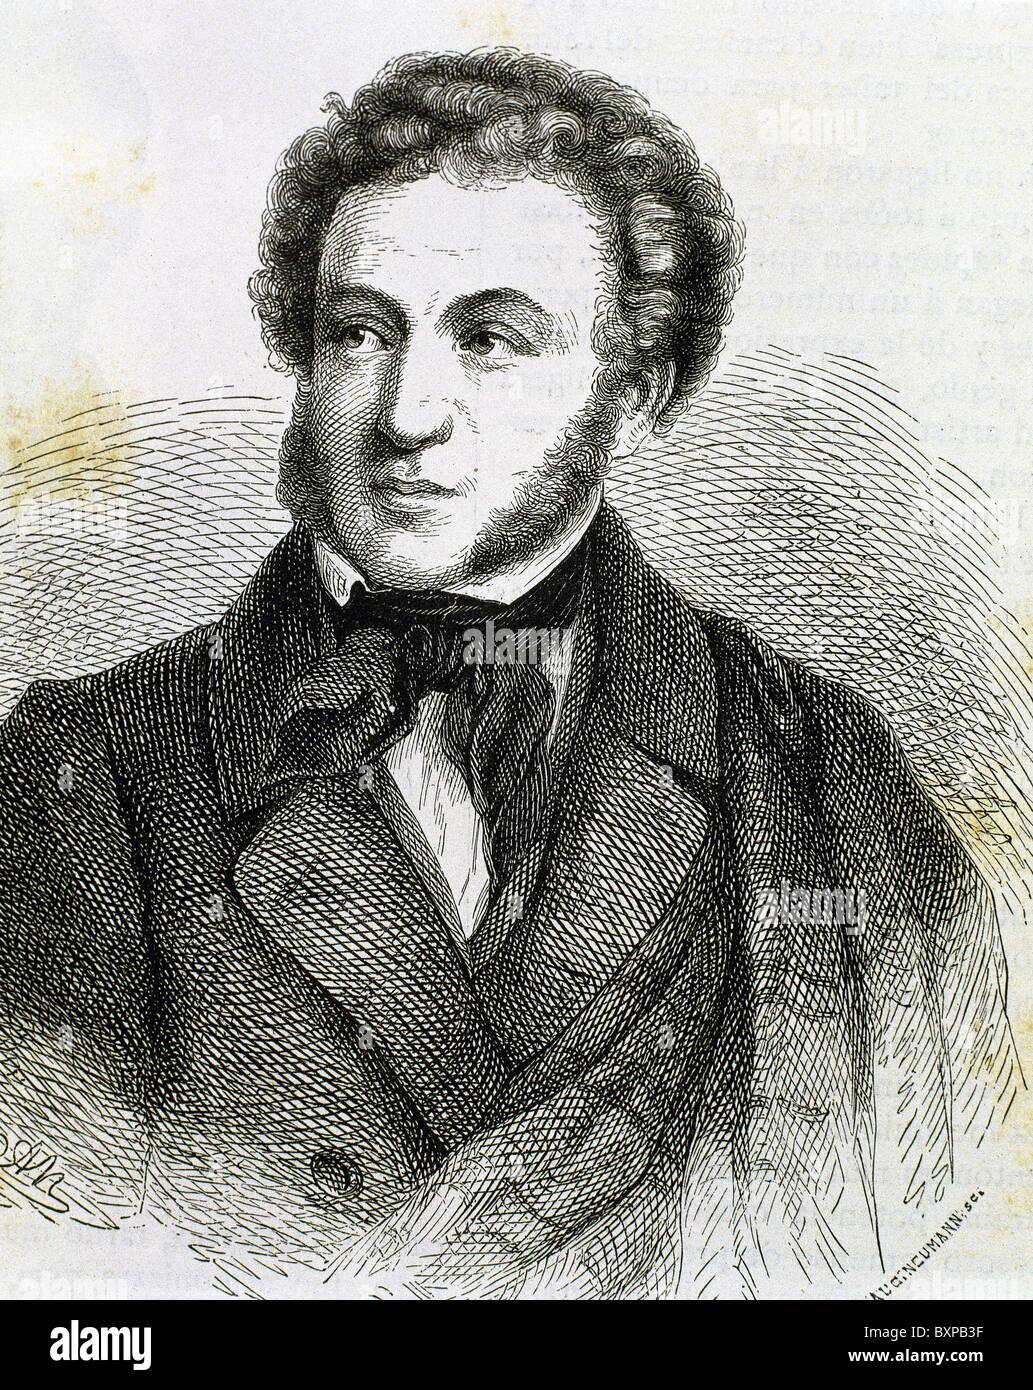 Pushkin, Aleksandr Sergeevic (Moscow ,1799-Petersburg, 1837). Russian poet. Engraving. - Stock Image